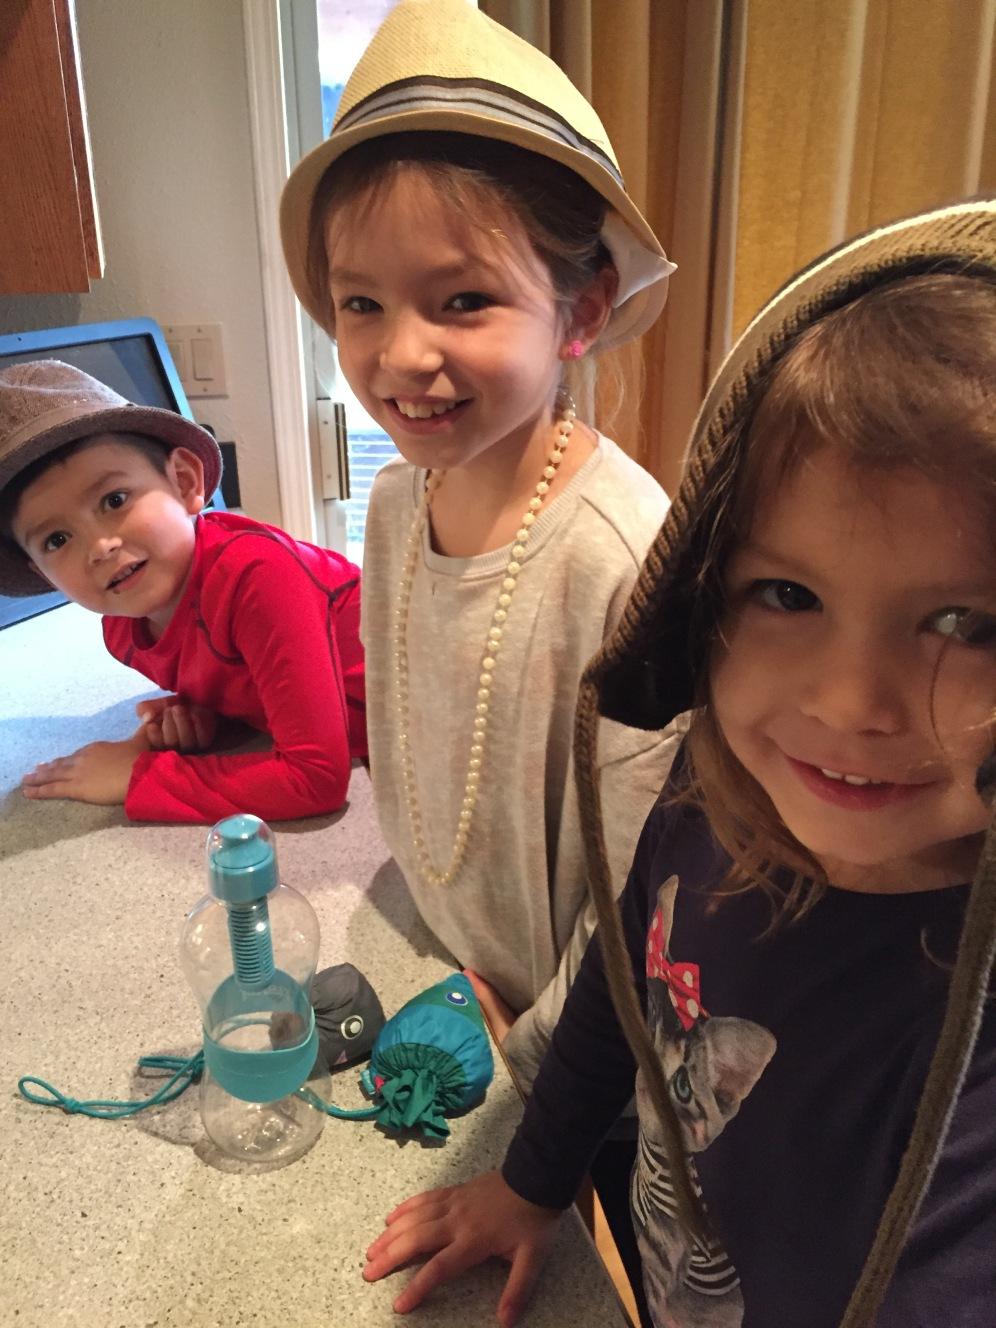 The baking crew: Finn, Ruby and Janie